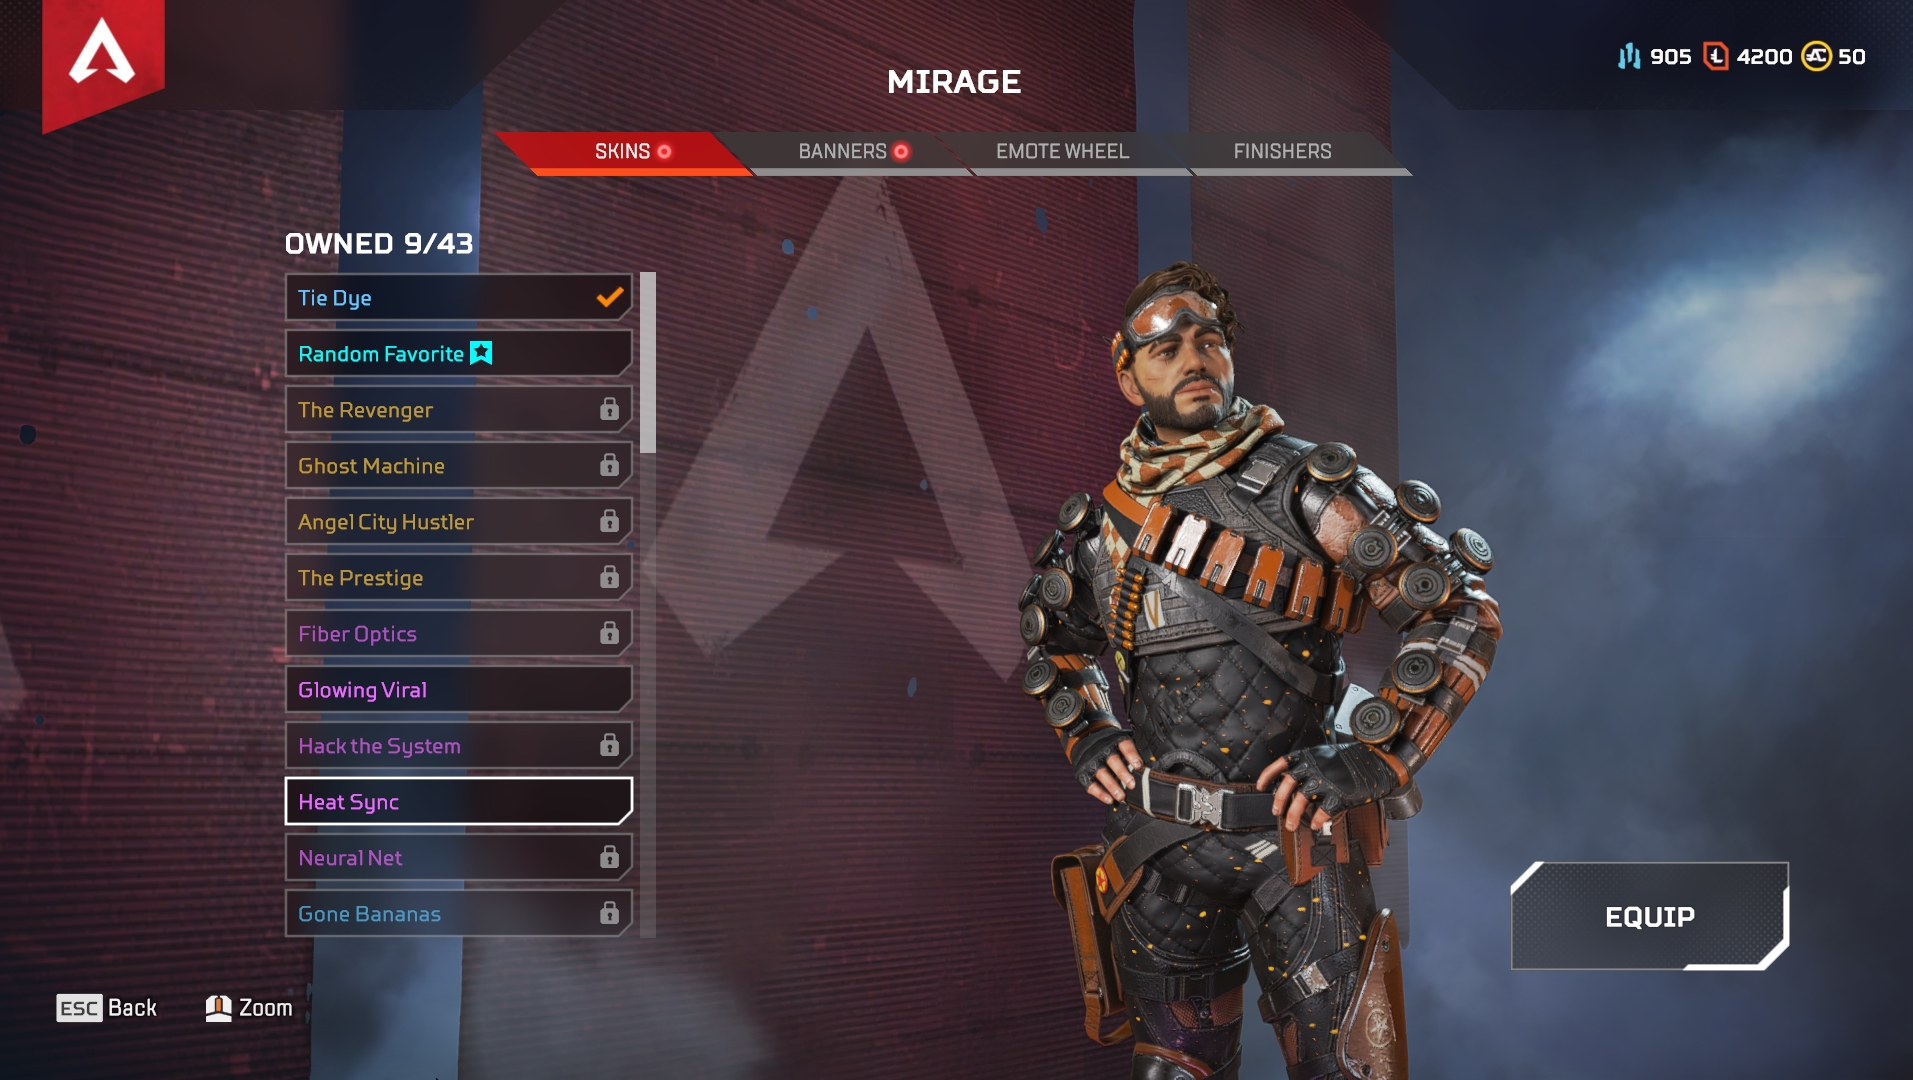 Mirage Apex Legends